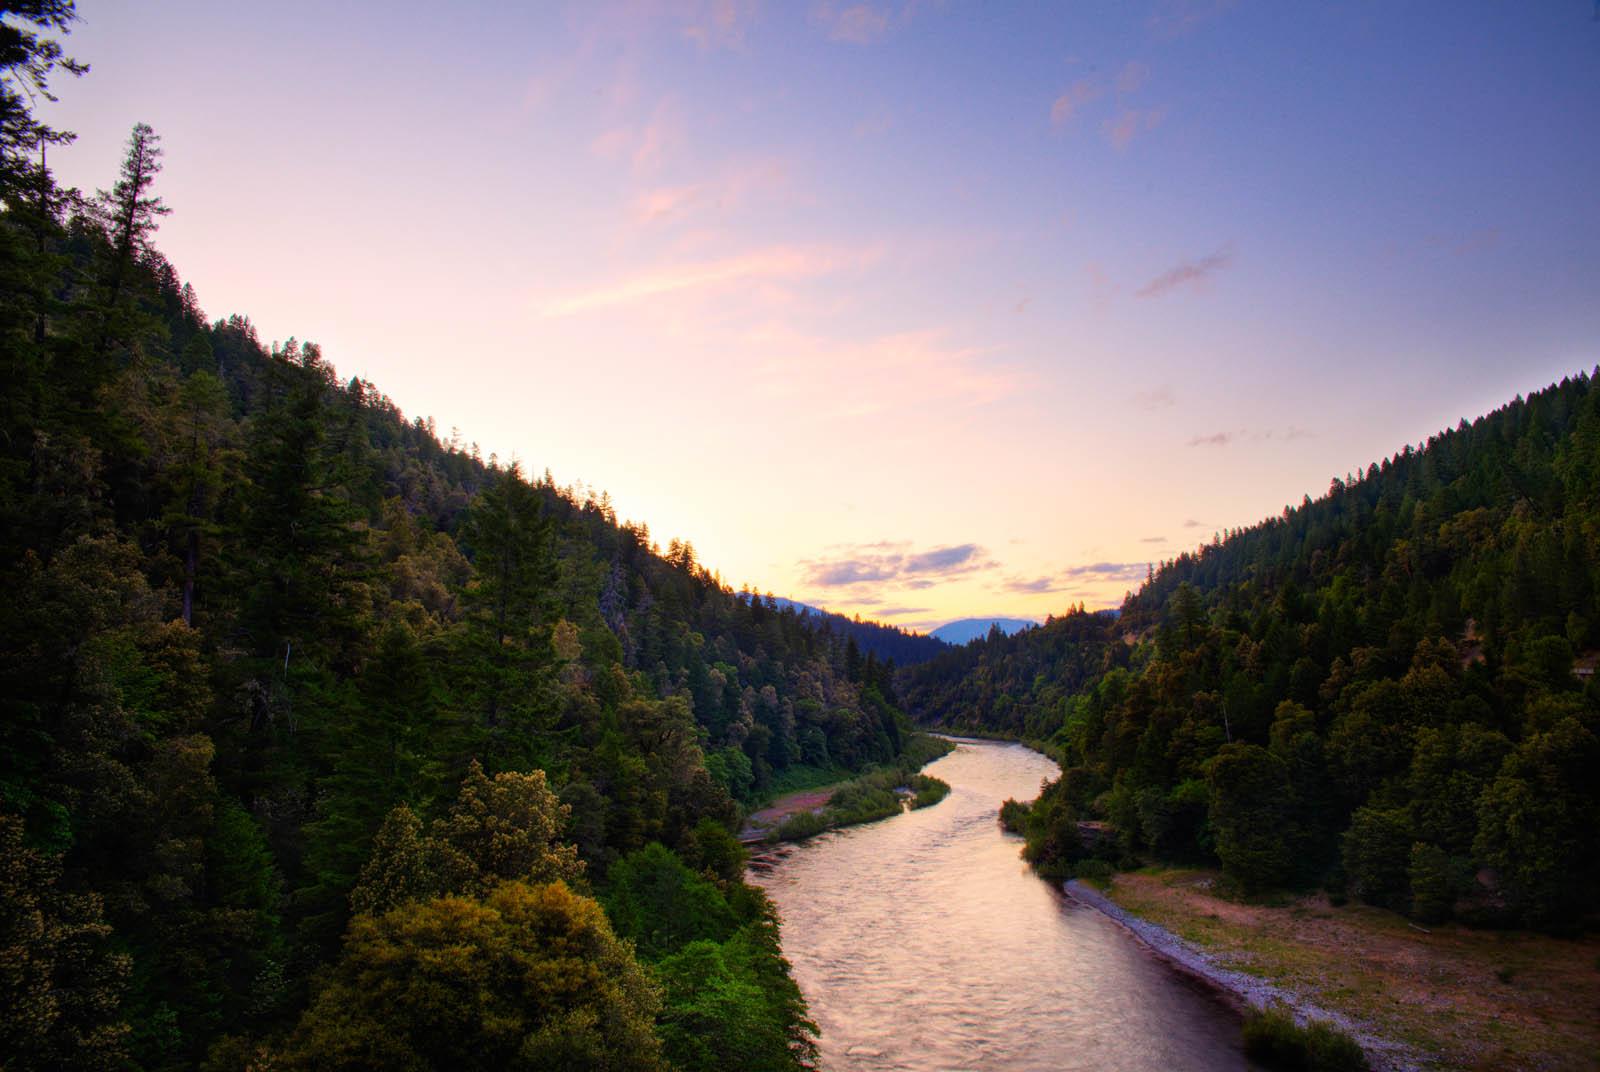 Klamath River at dusk